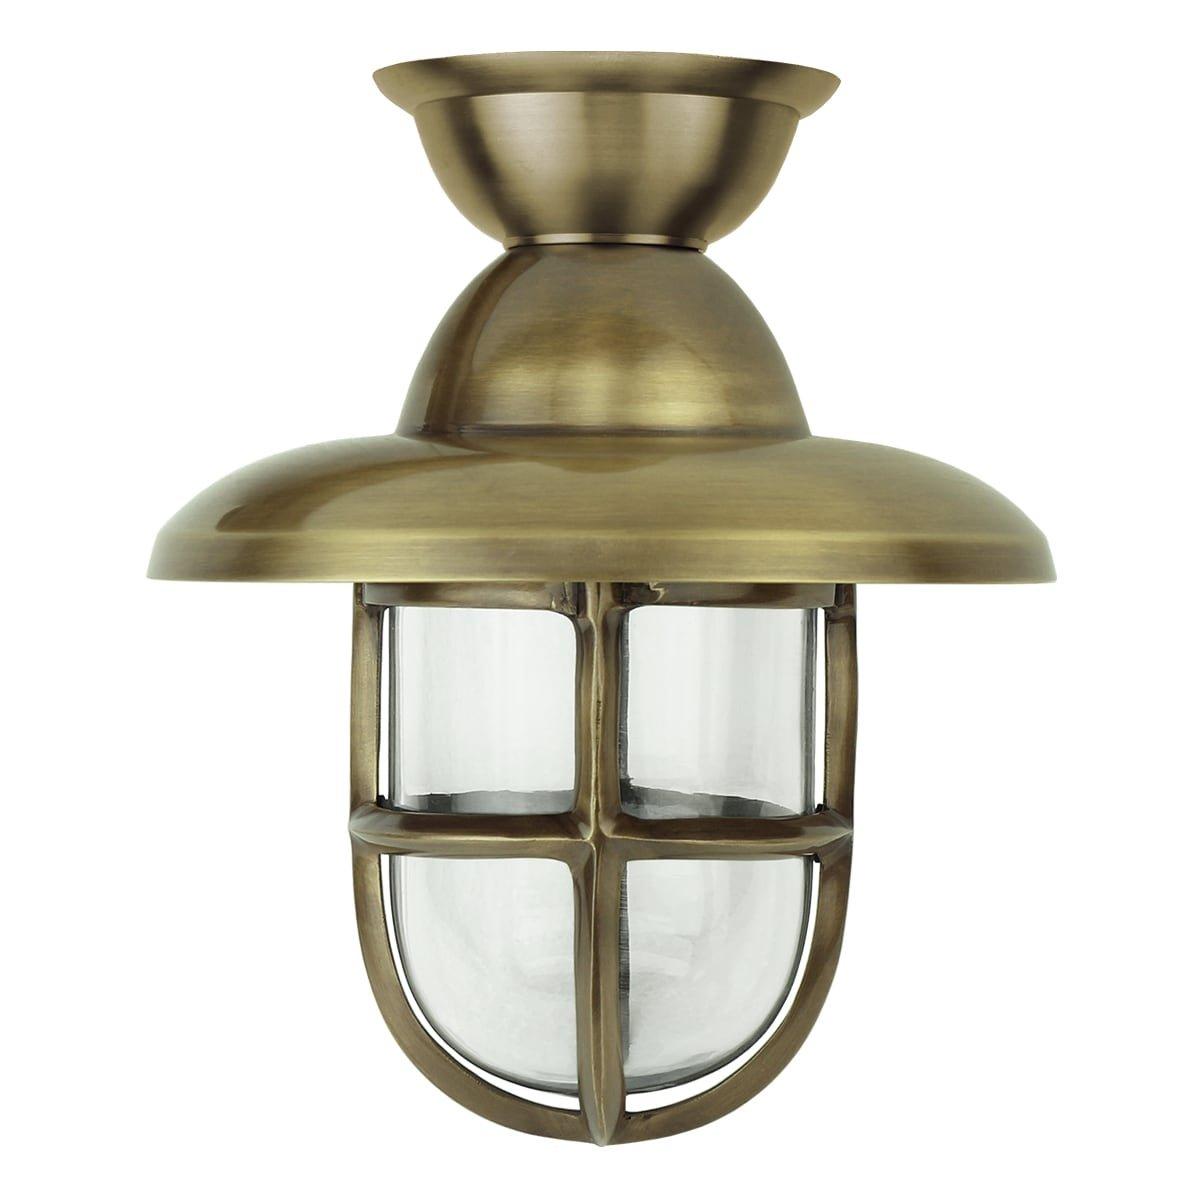 Outdoor lighting Maritime nautical Ship light Marine brass - 42 cm